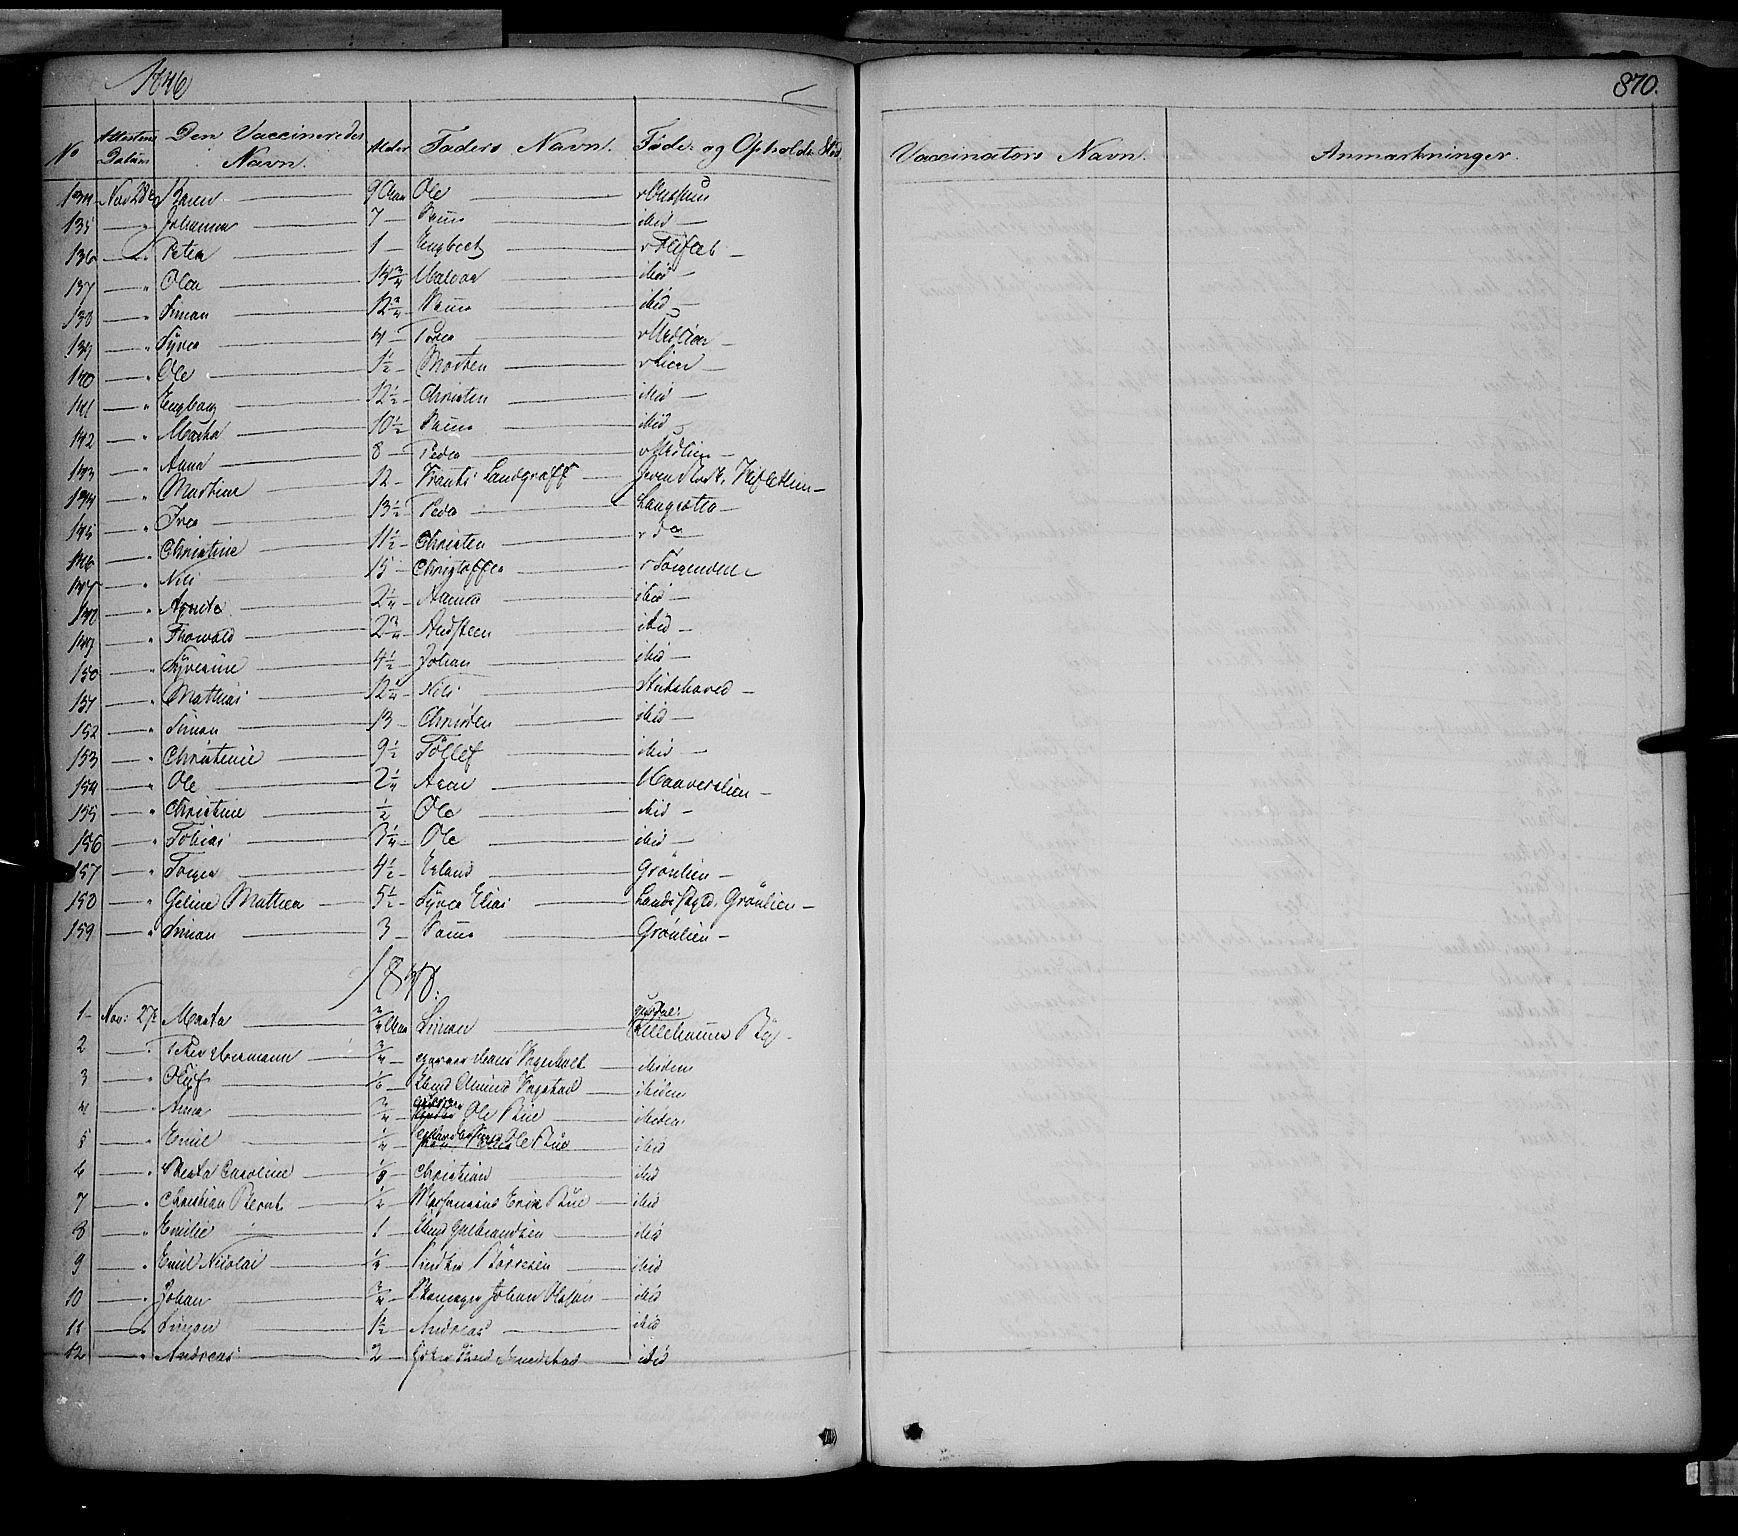 SAH, Fåberg prestekontor, Ministerialbok nr. 5, 1836-1854, s. 869-870